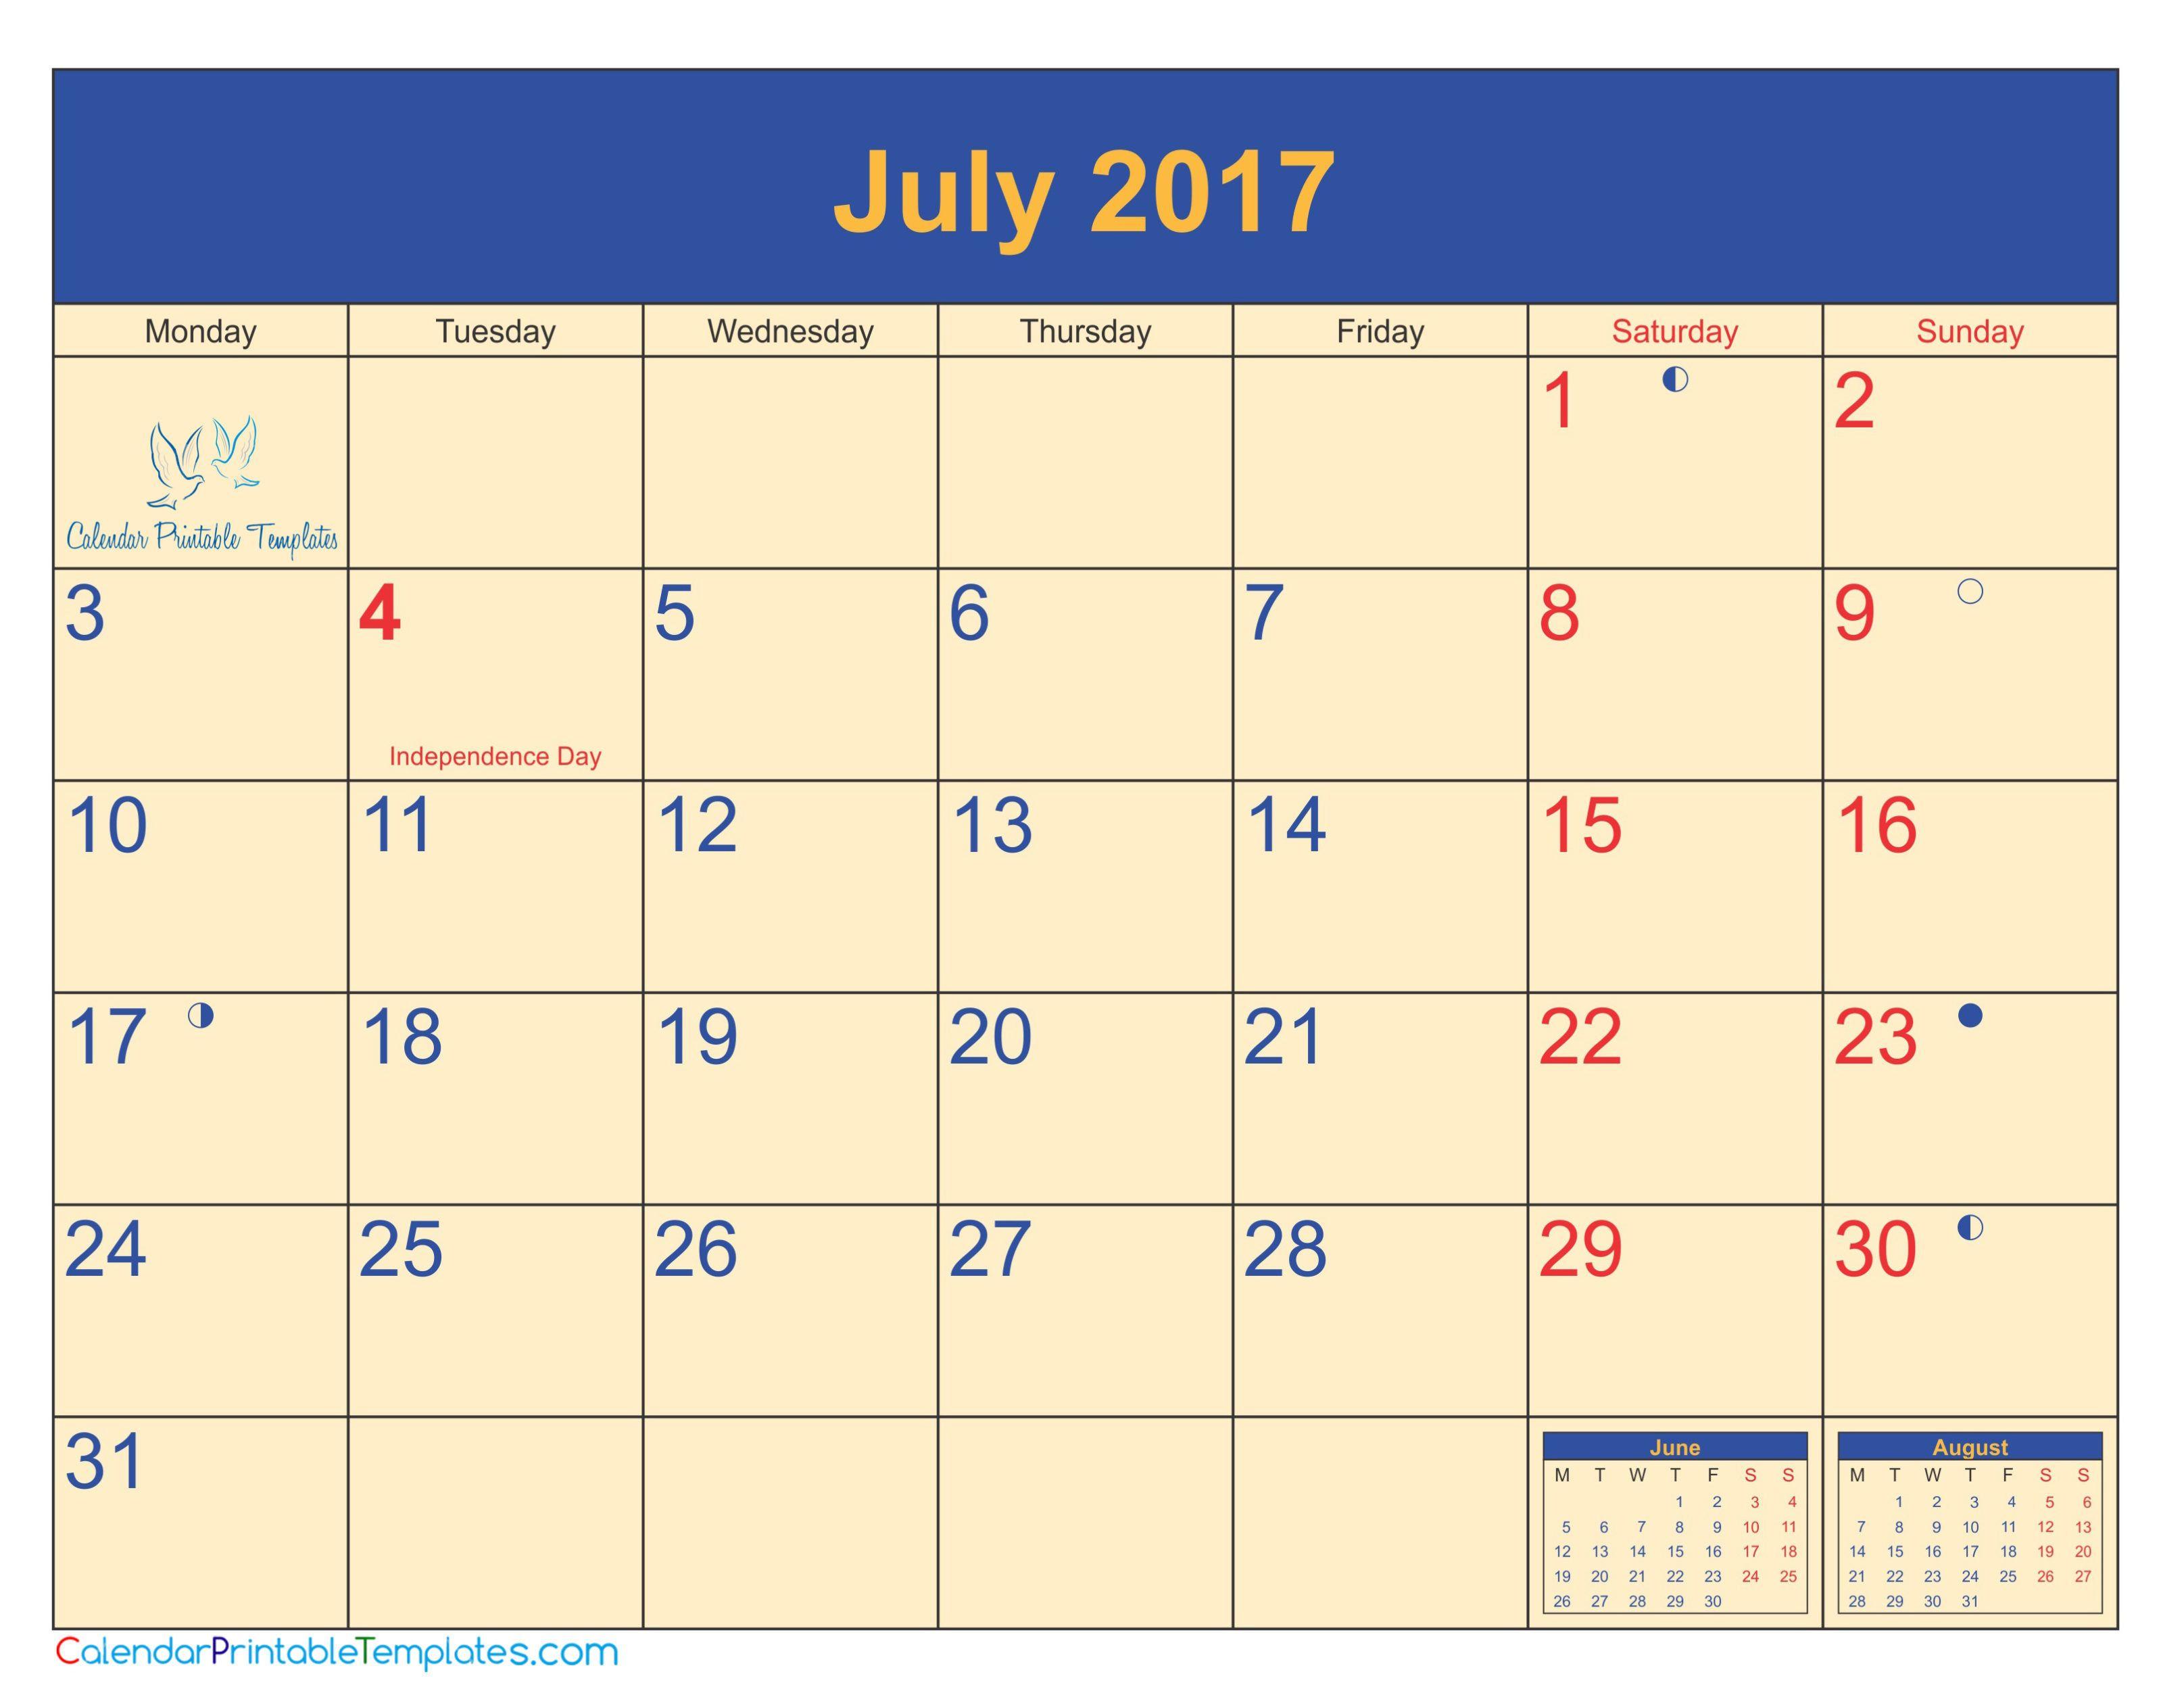 July 2017 calendar pdf http://www.calendarprintabletemplates.com ...